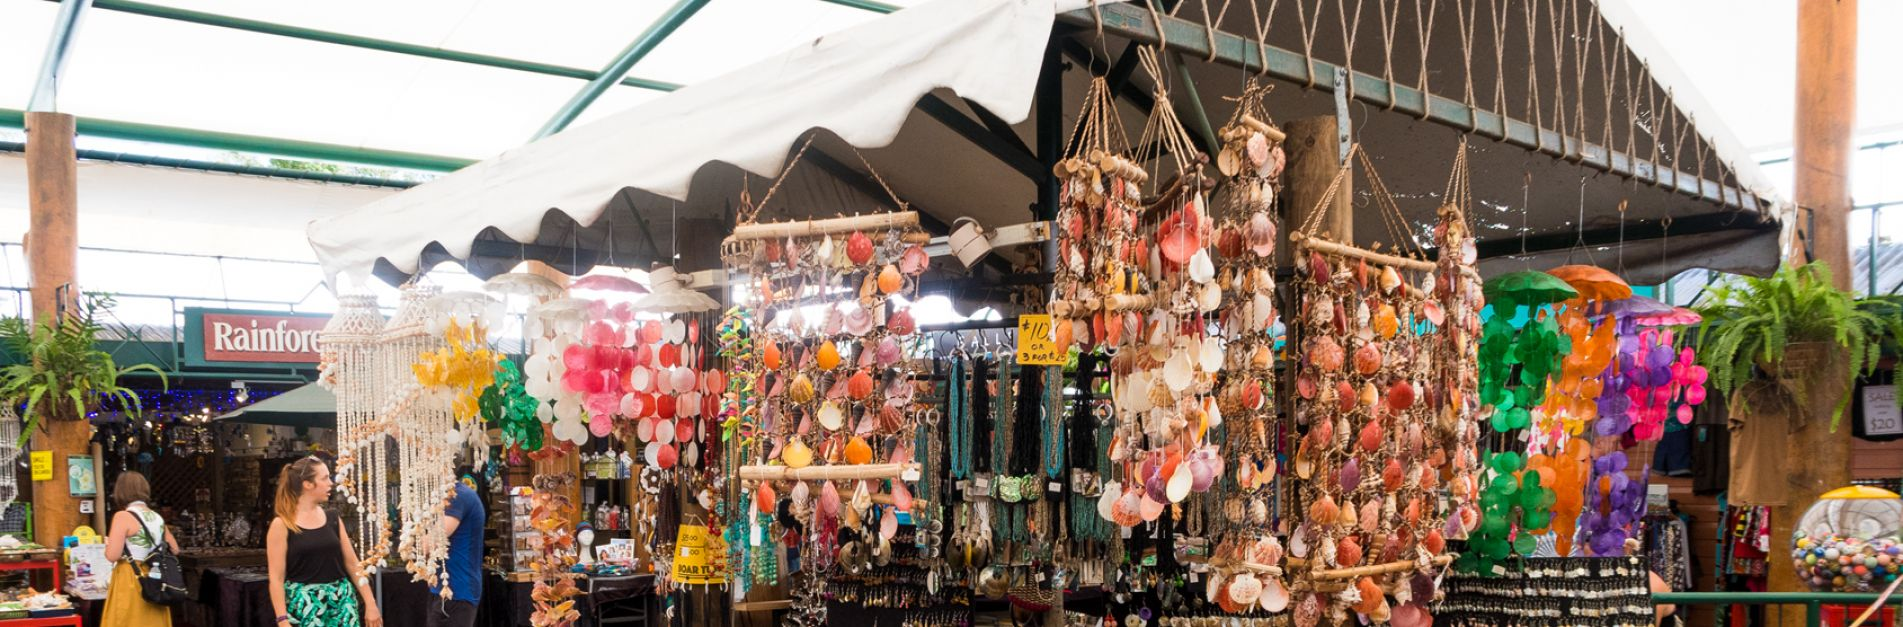 80-29062018181836-0-0-1689-556-1903x627-cropped-chimes-and-jewellery-at-kuranda-village-hub